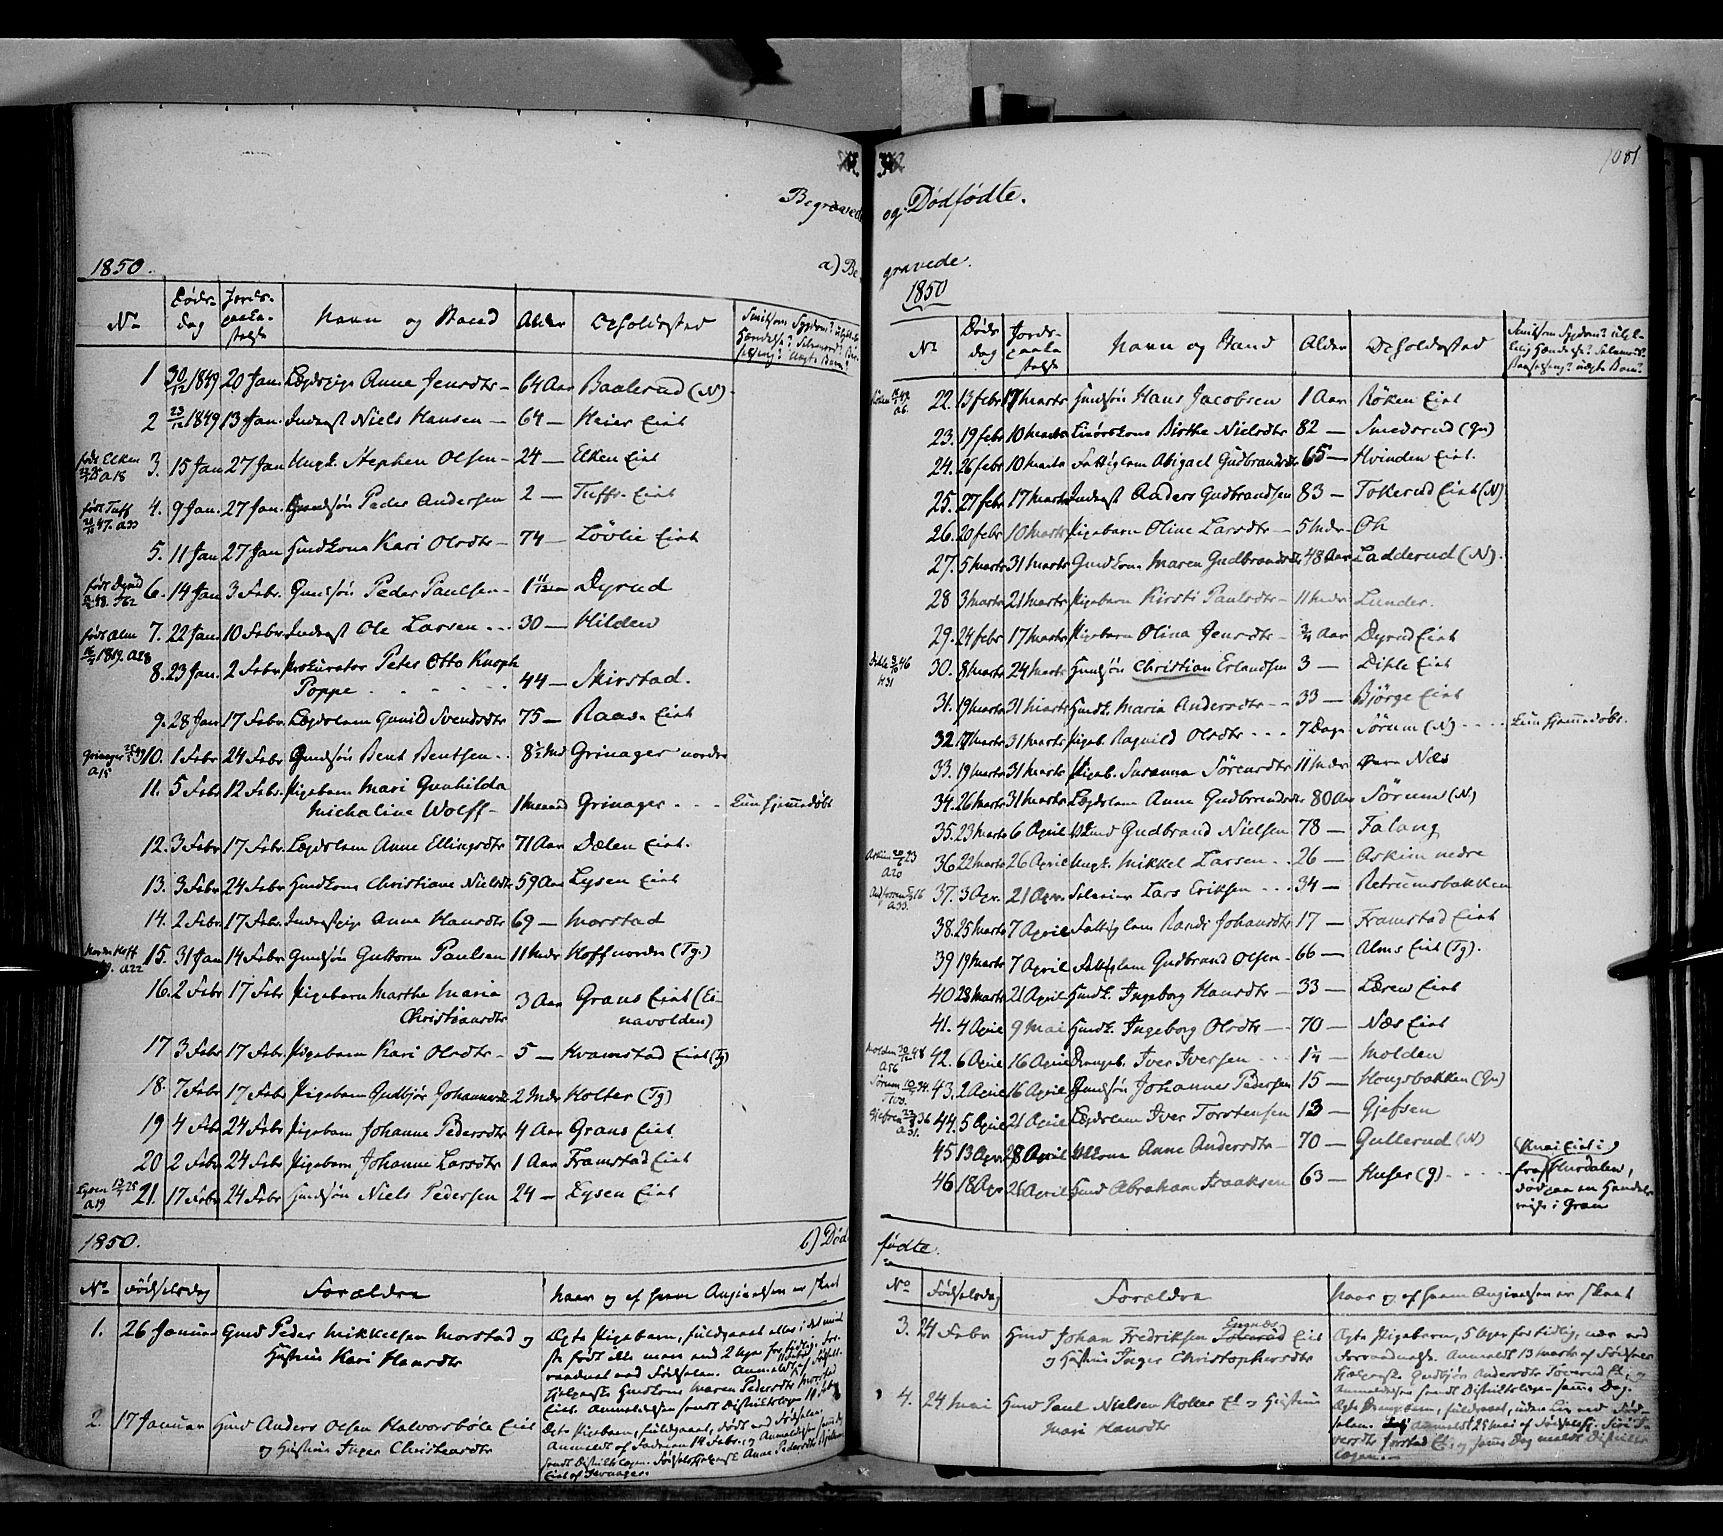 SAH, Gran prestekontor, Ministerialbok nr. 11, 1842-1856, s. 1080-1081